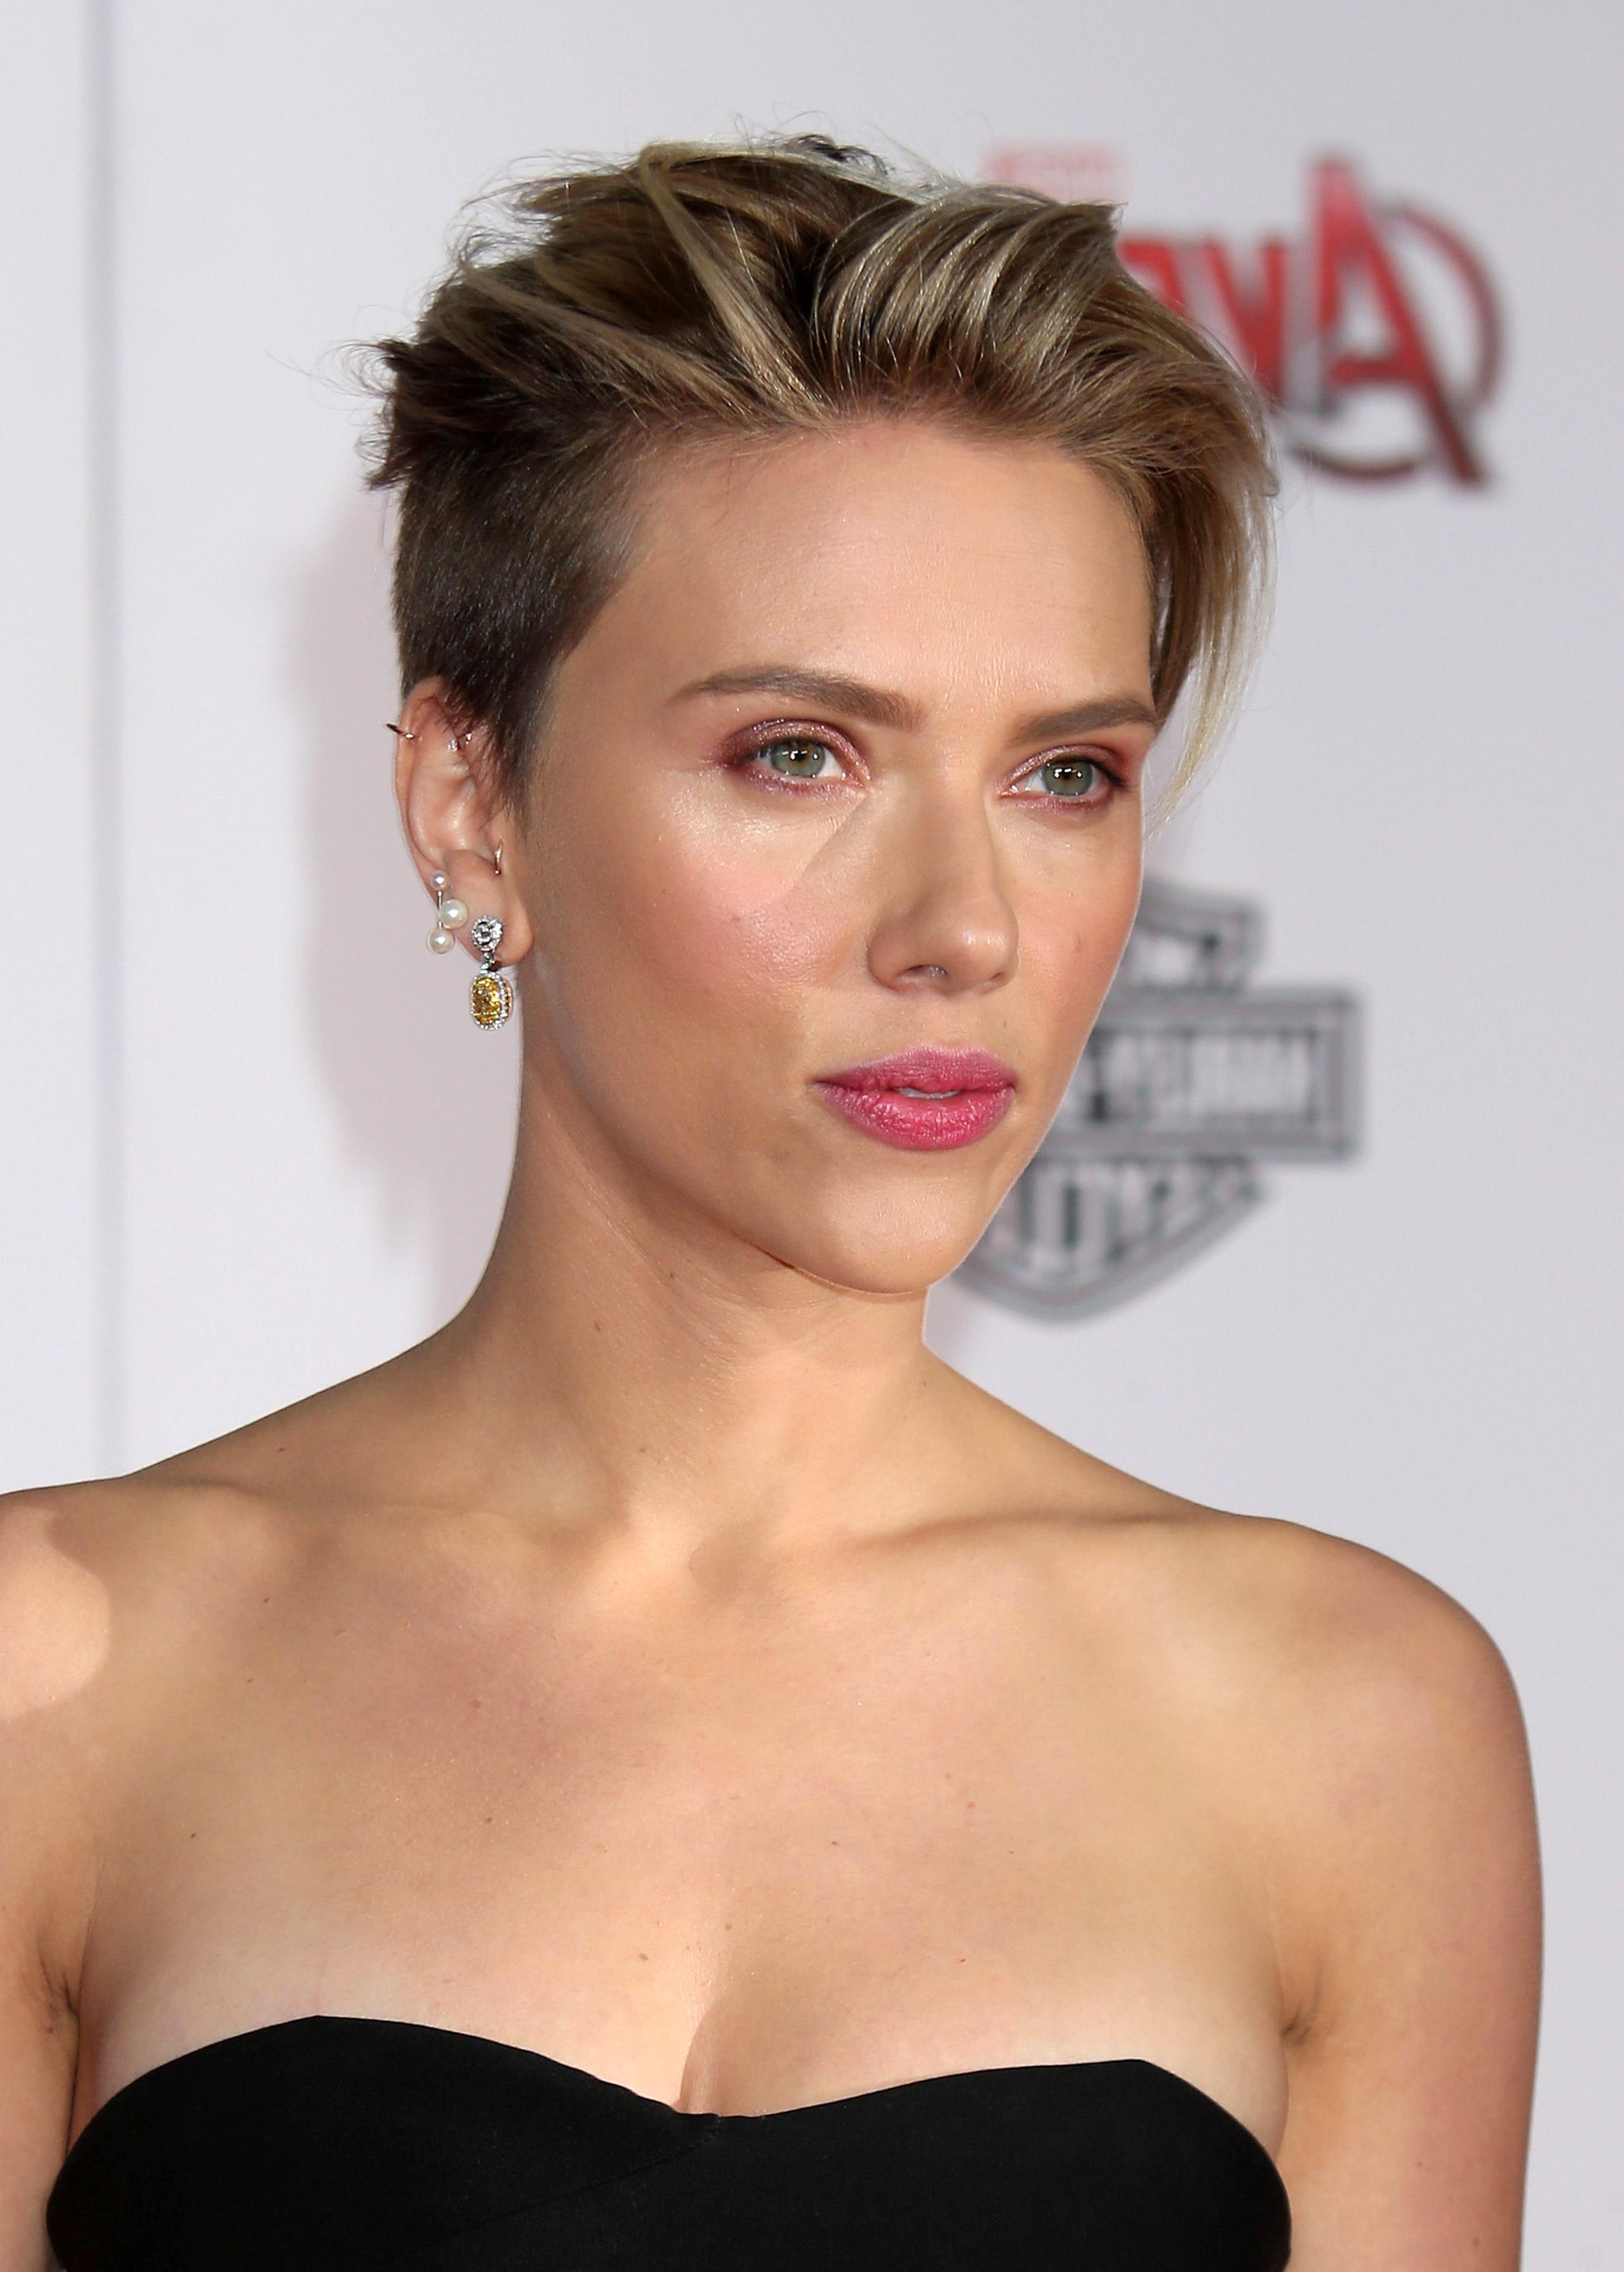 Pinkristi Barber On Scarlett Johansson (View 2 of 25)